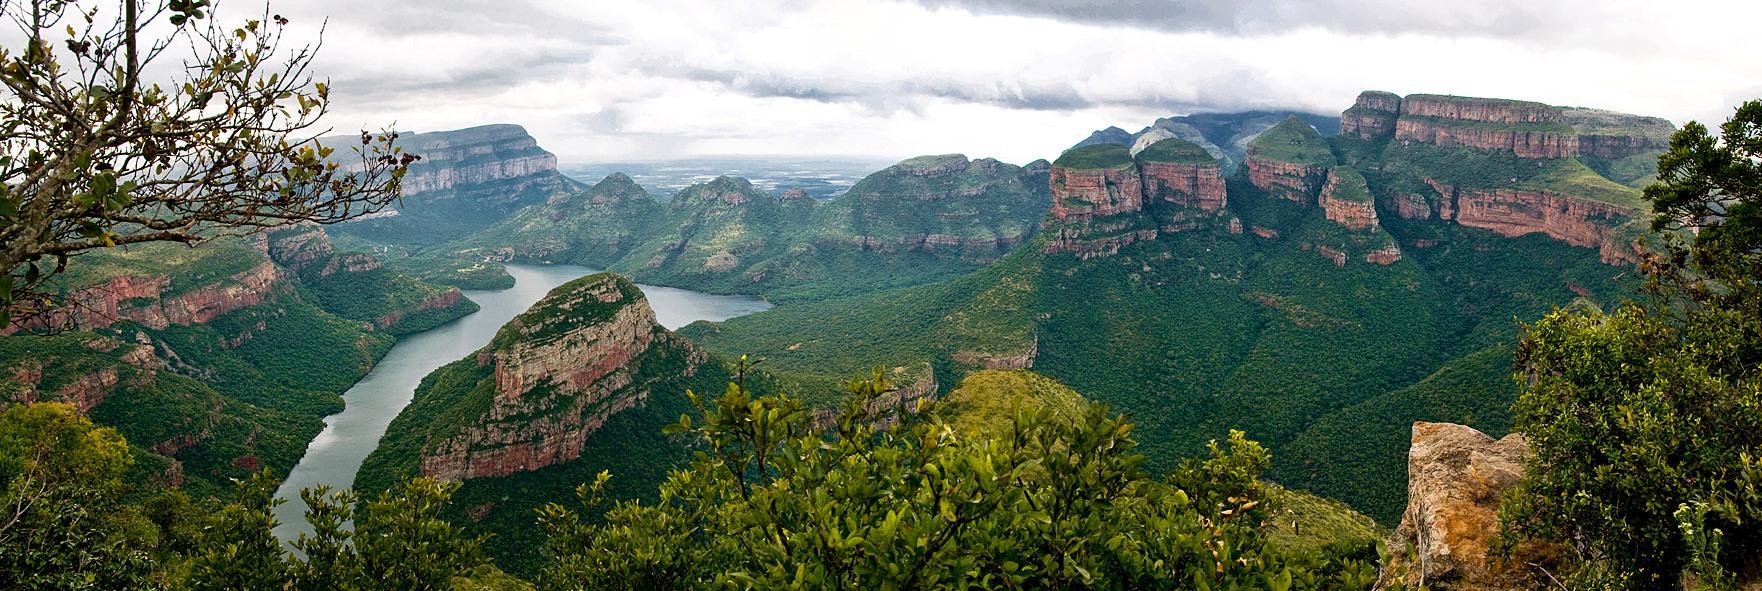 Каньйон річки Блайд (Blyde River Canyon) (6)